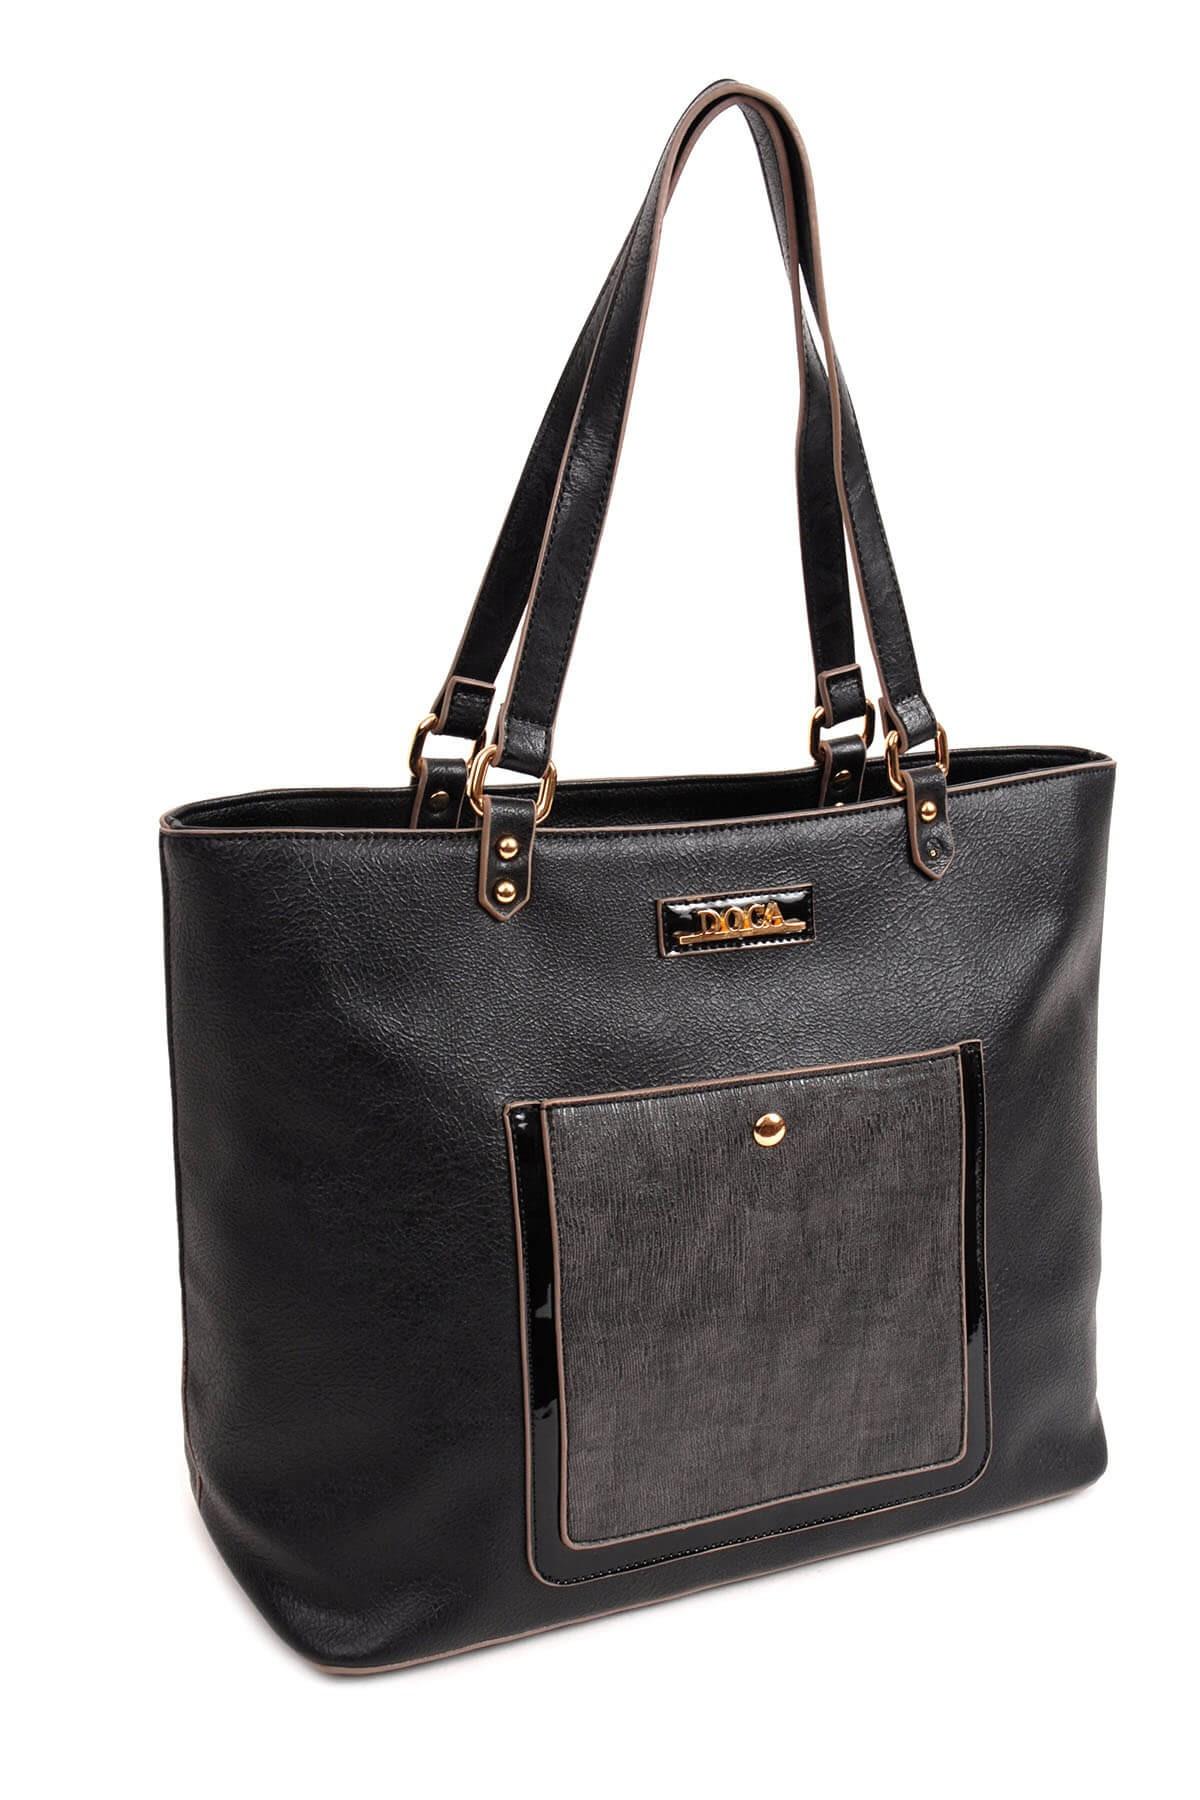 Dámska kabelka Doca 13938 - čierna